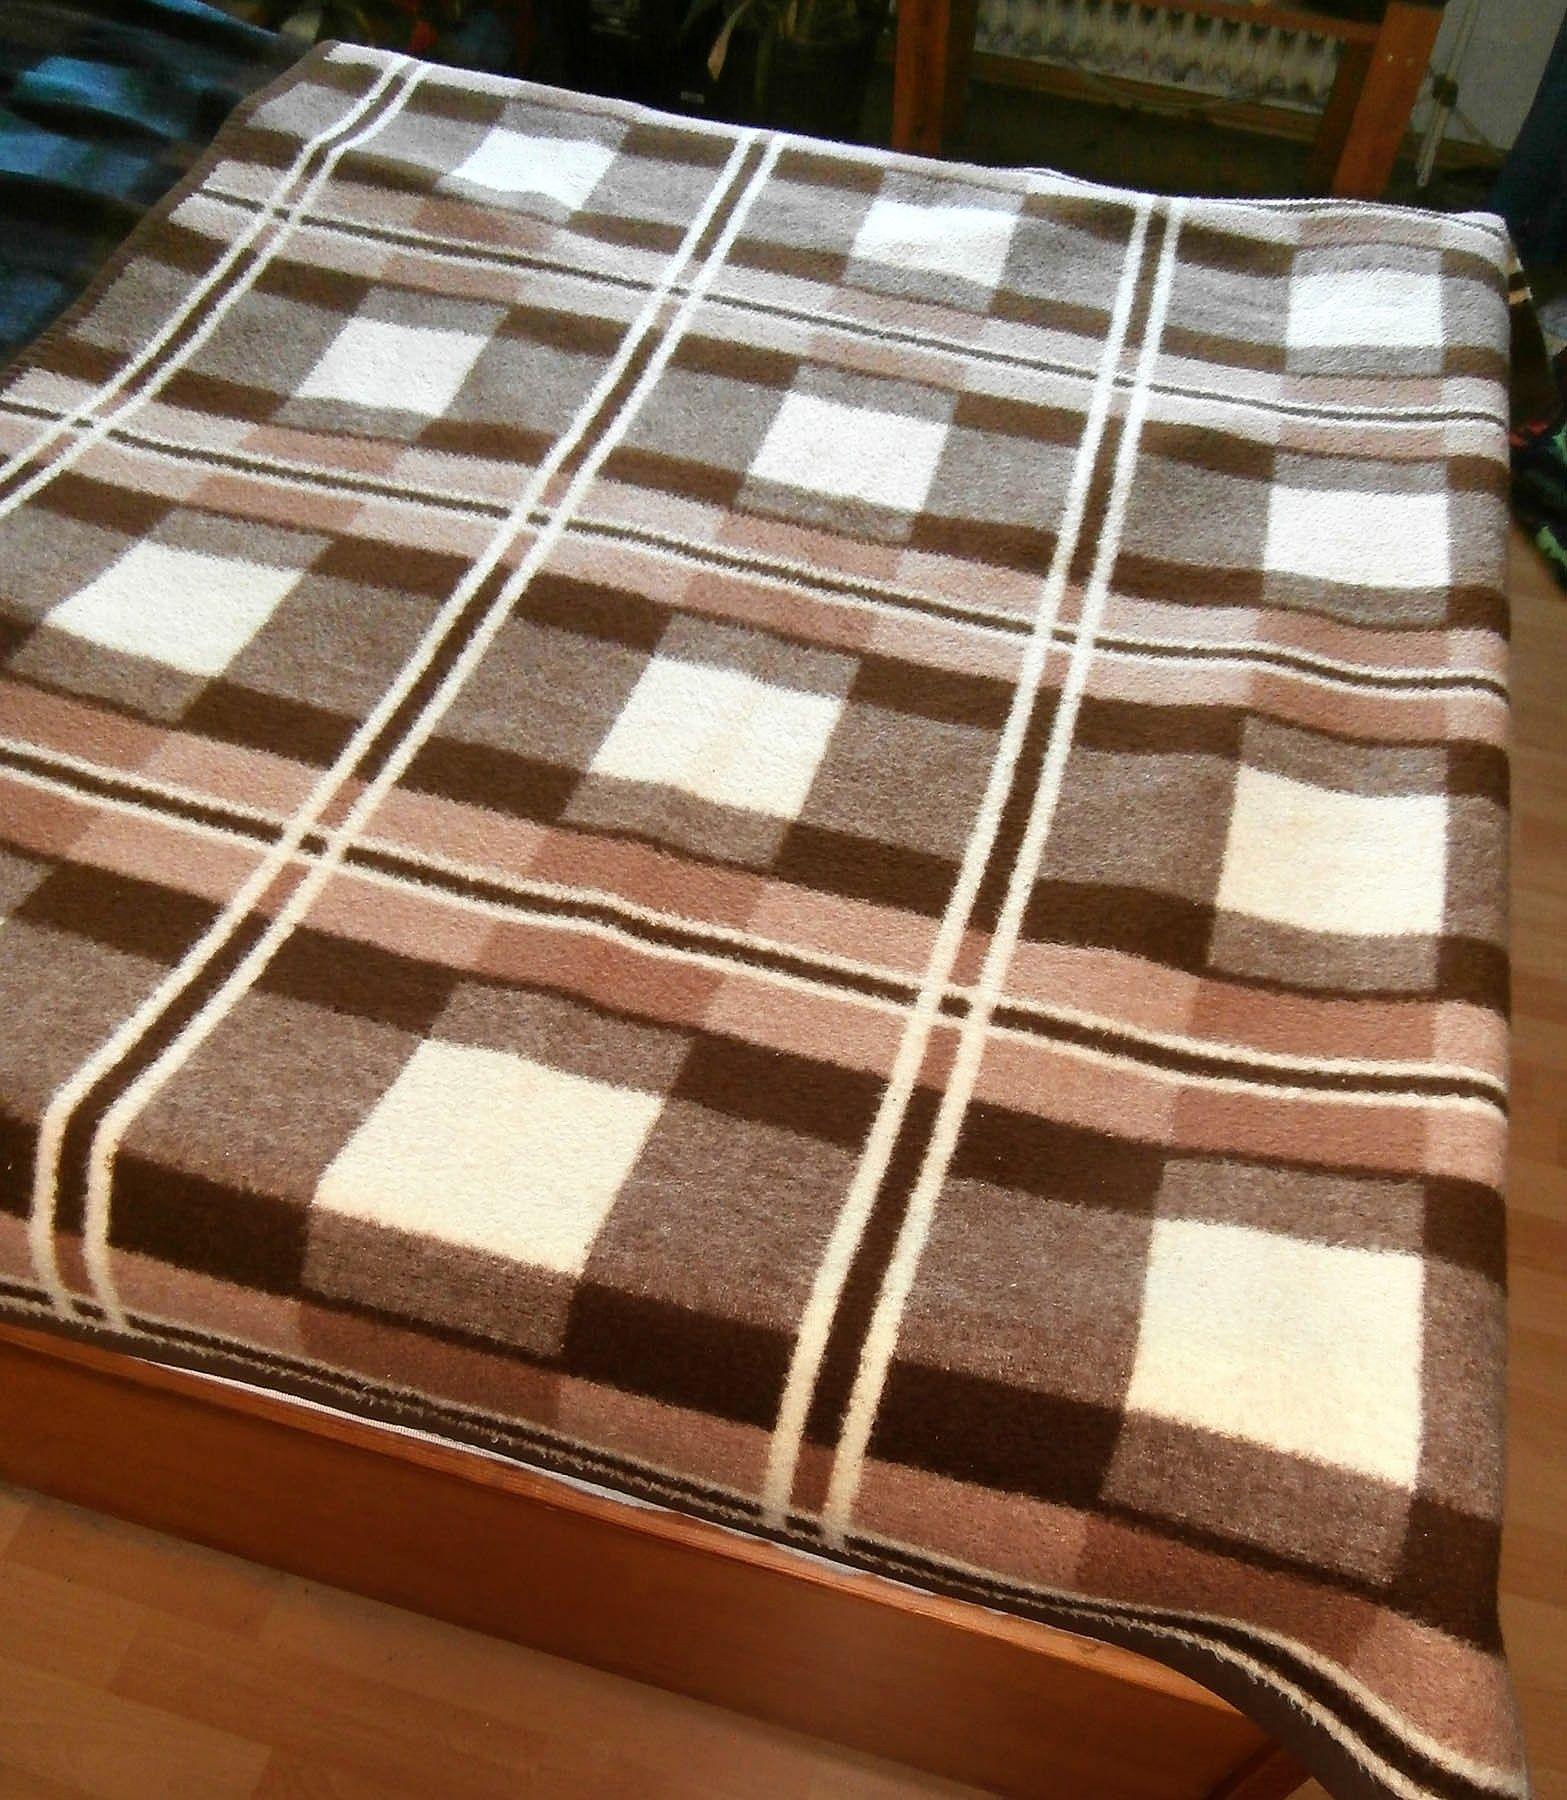 Carblanket Woolblanket Retroblankets Blanketmuseum Woolenblanket 50s 60s Campervan Oudedekens Vintageblanket Vintaged Wolldecke Deckchen Second Hand